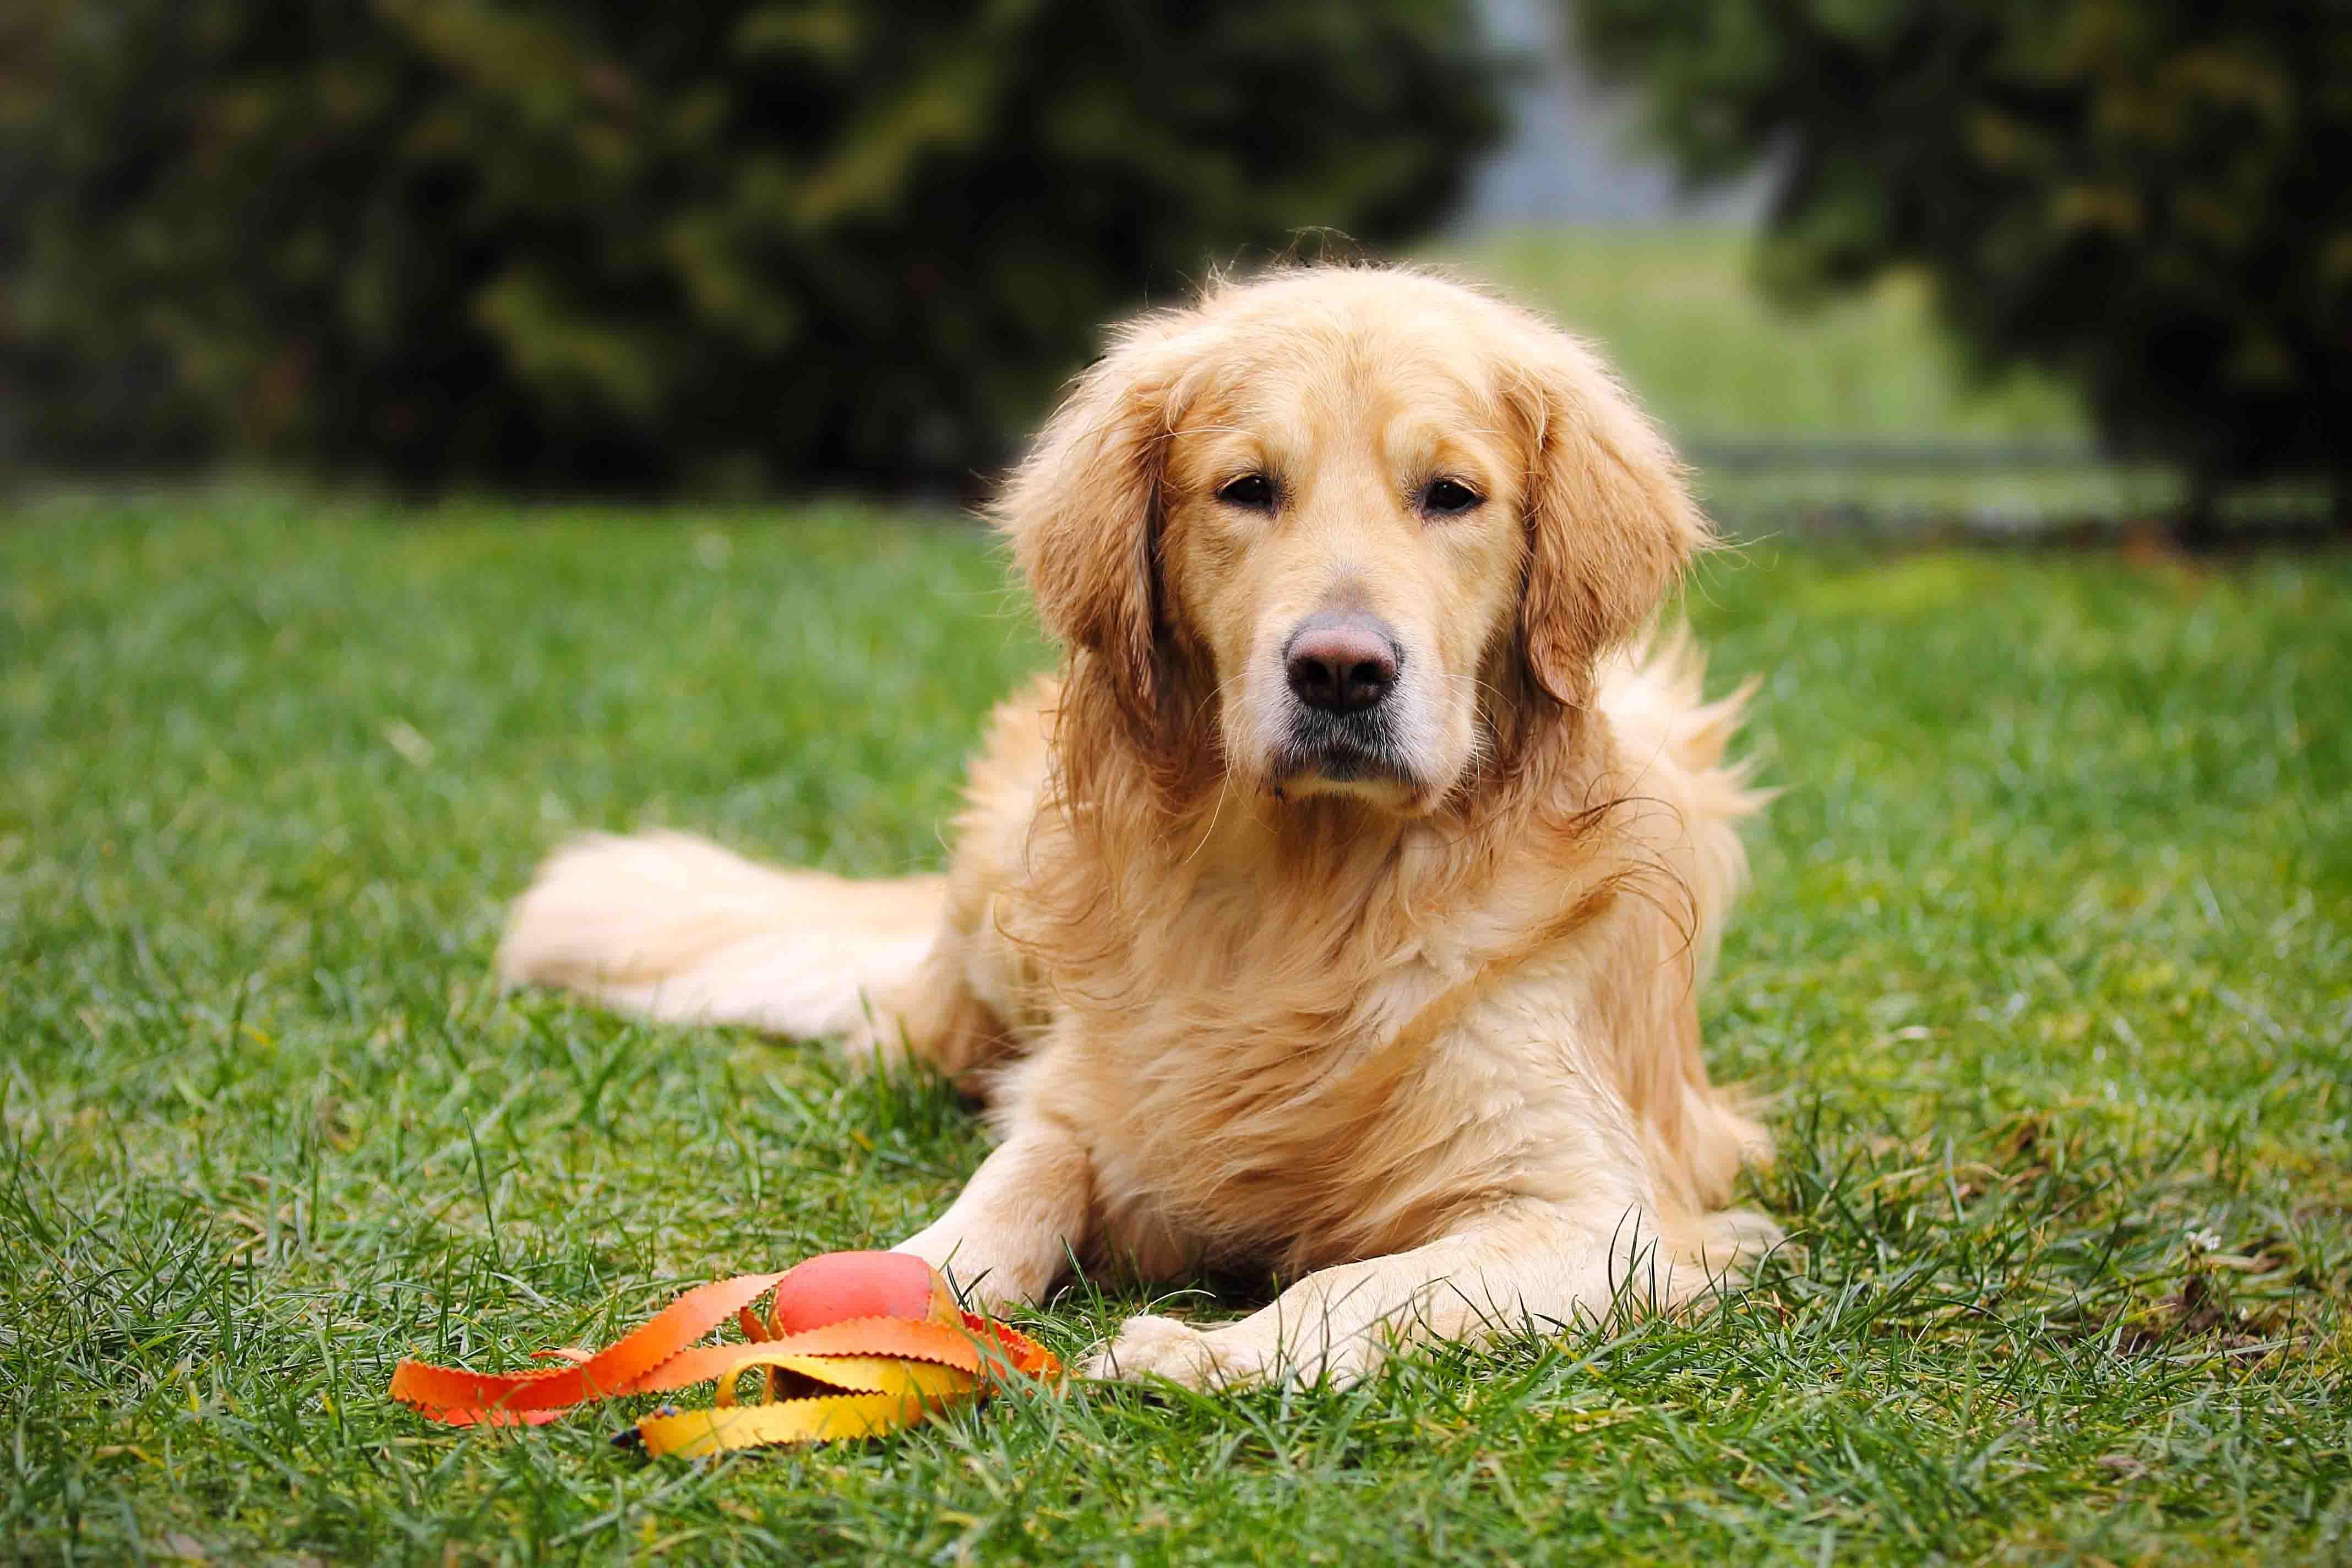 Tierfotografie und Hundefotografie IMG 4653w